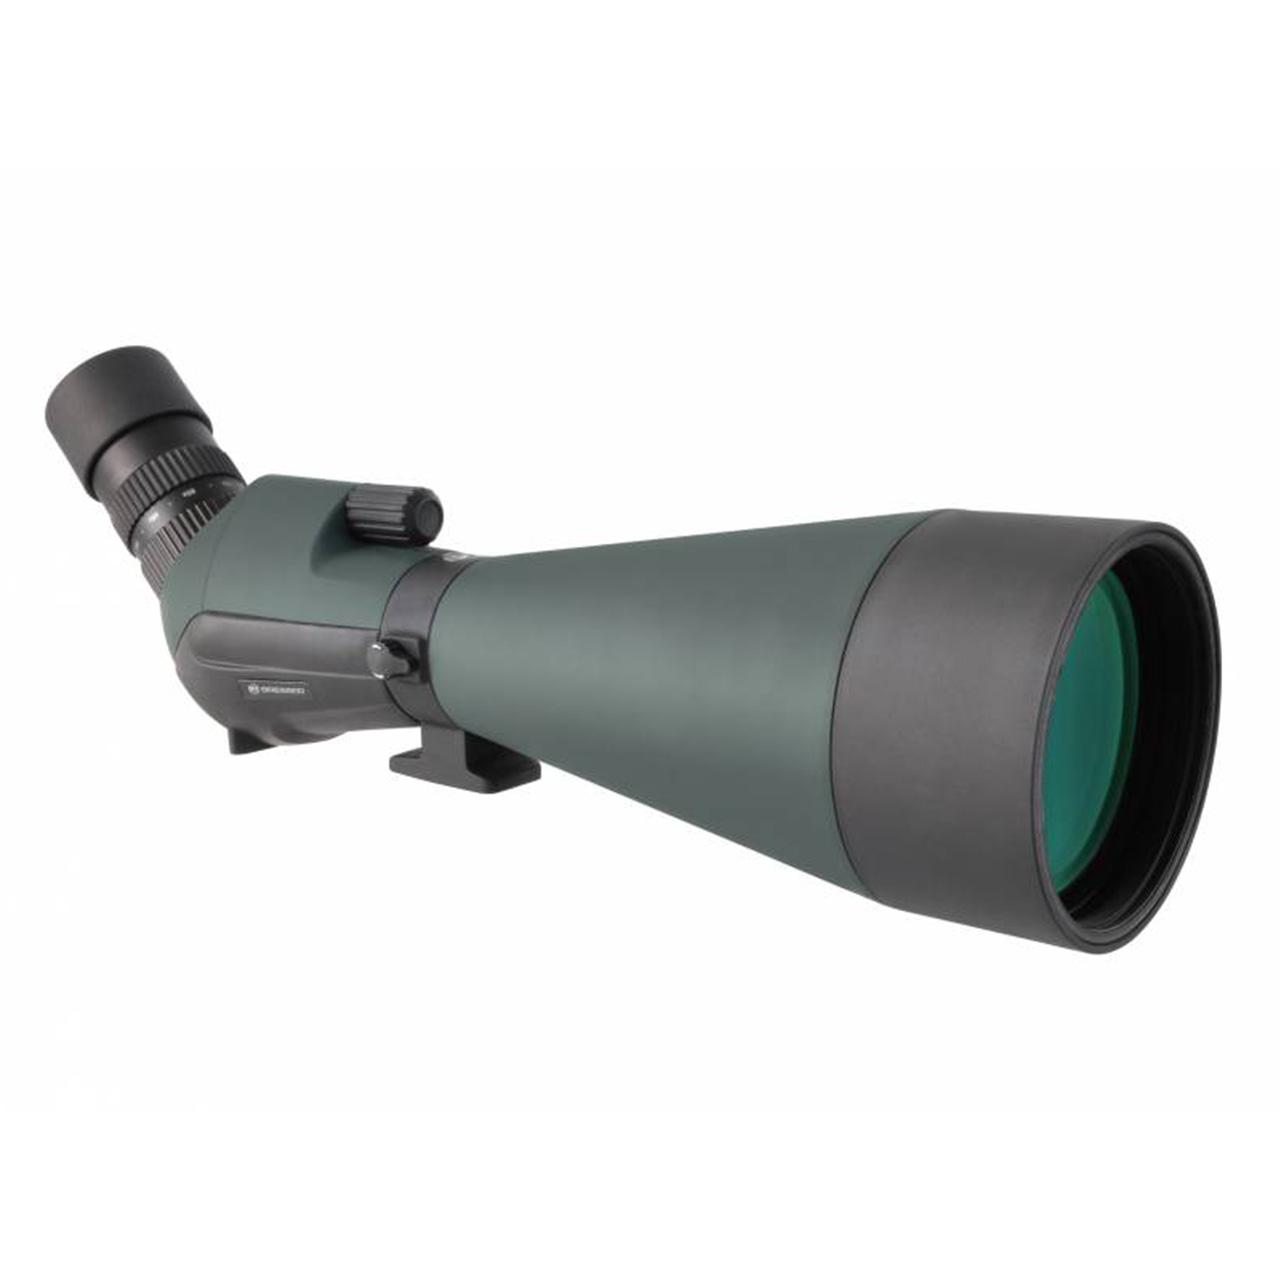 دوربین تک چشمی برسر مدل Condor 24-72X100